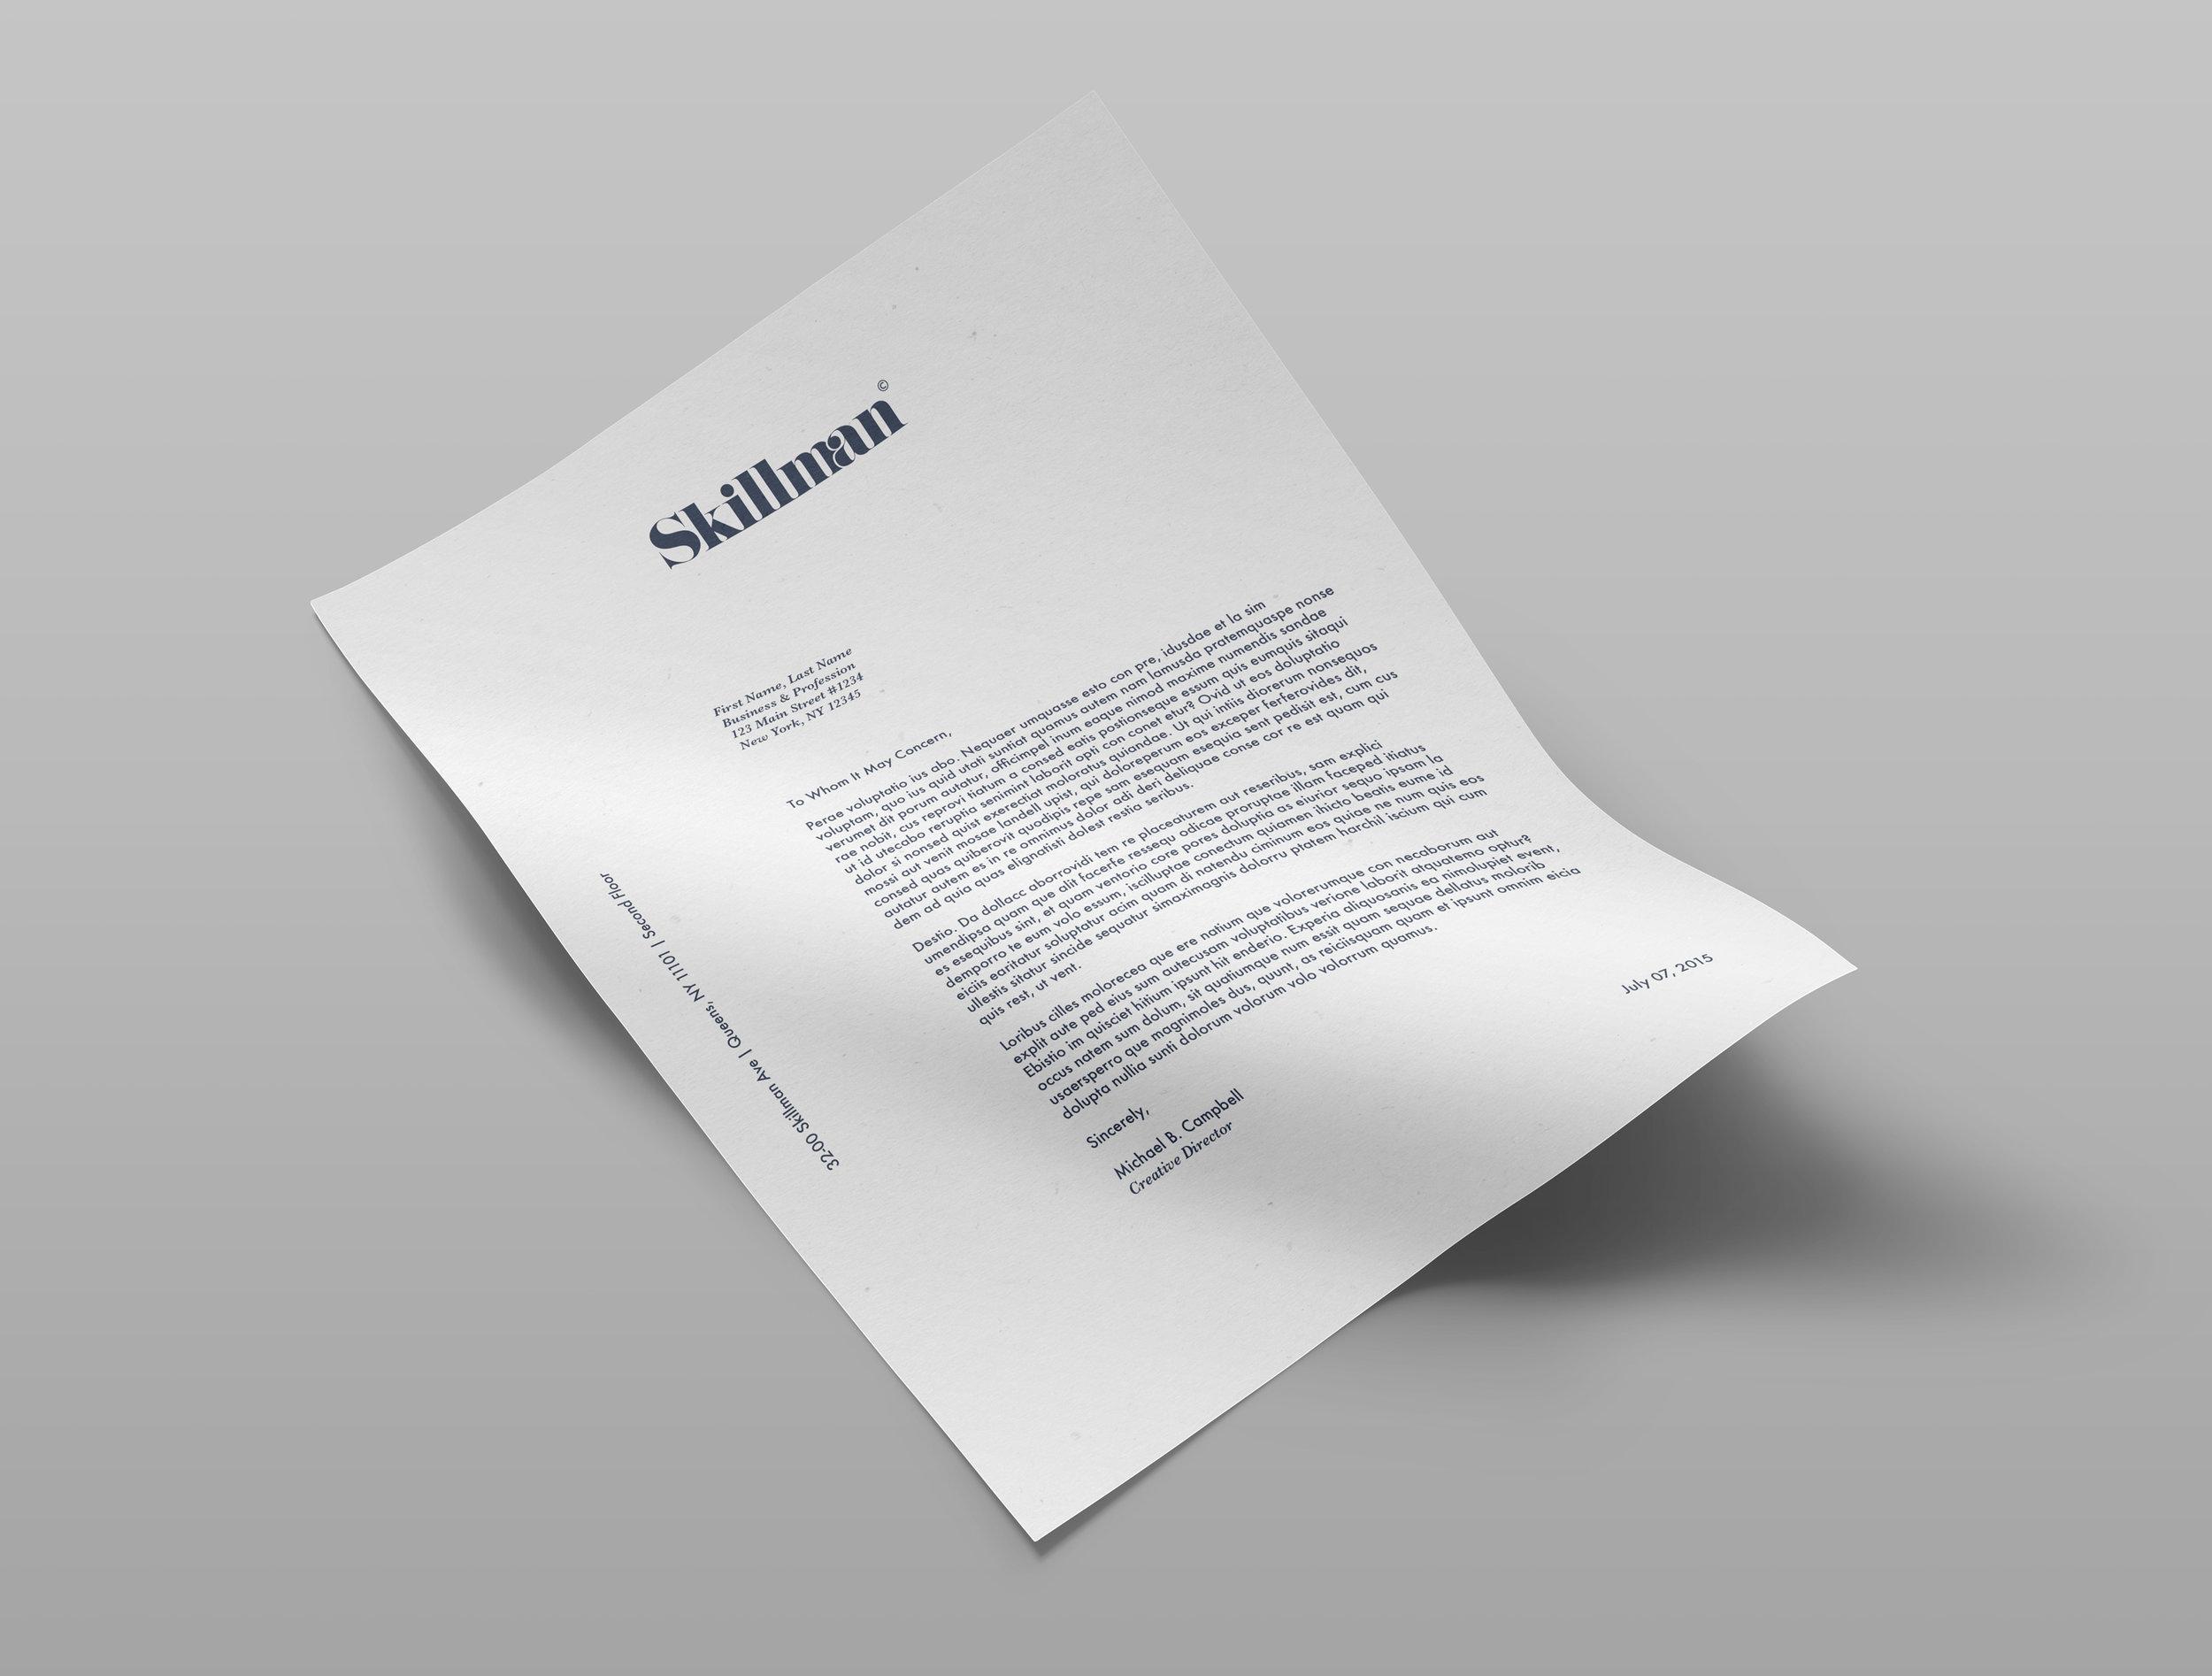 Studio_Bloq-Skillman-7.jpg